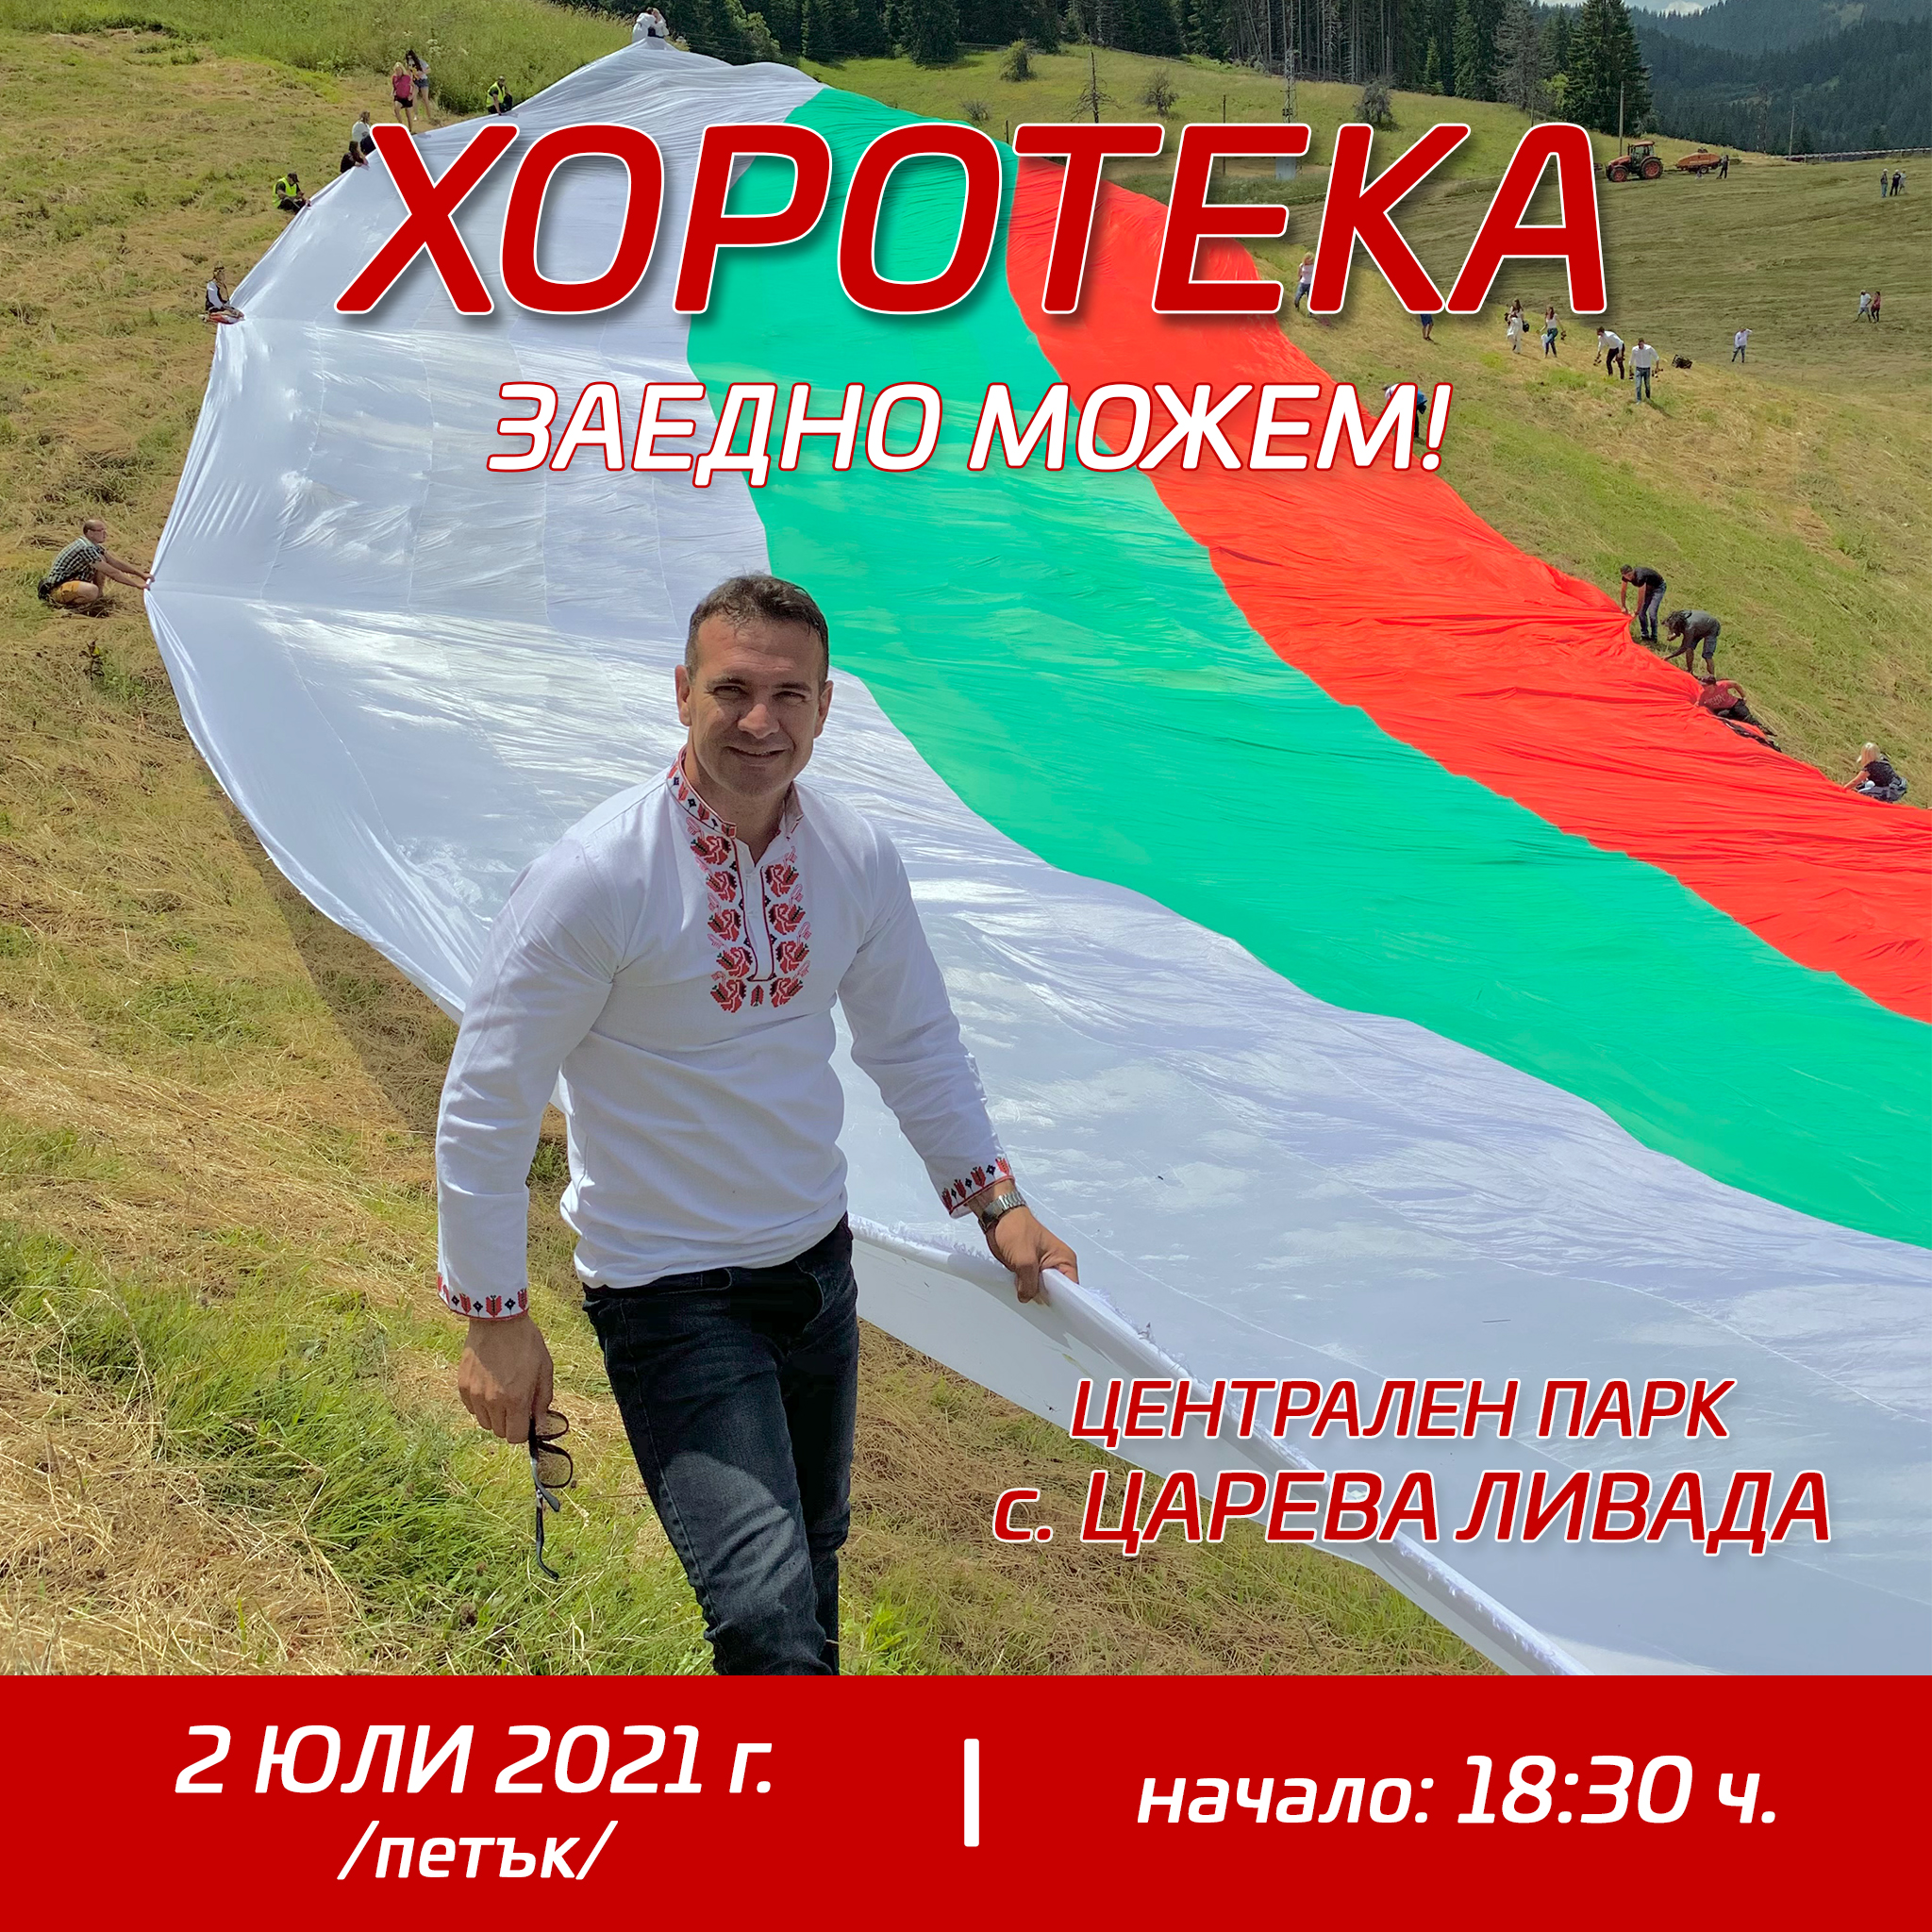 You are currently viewing Хоротека в село Царева ливада